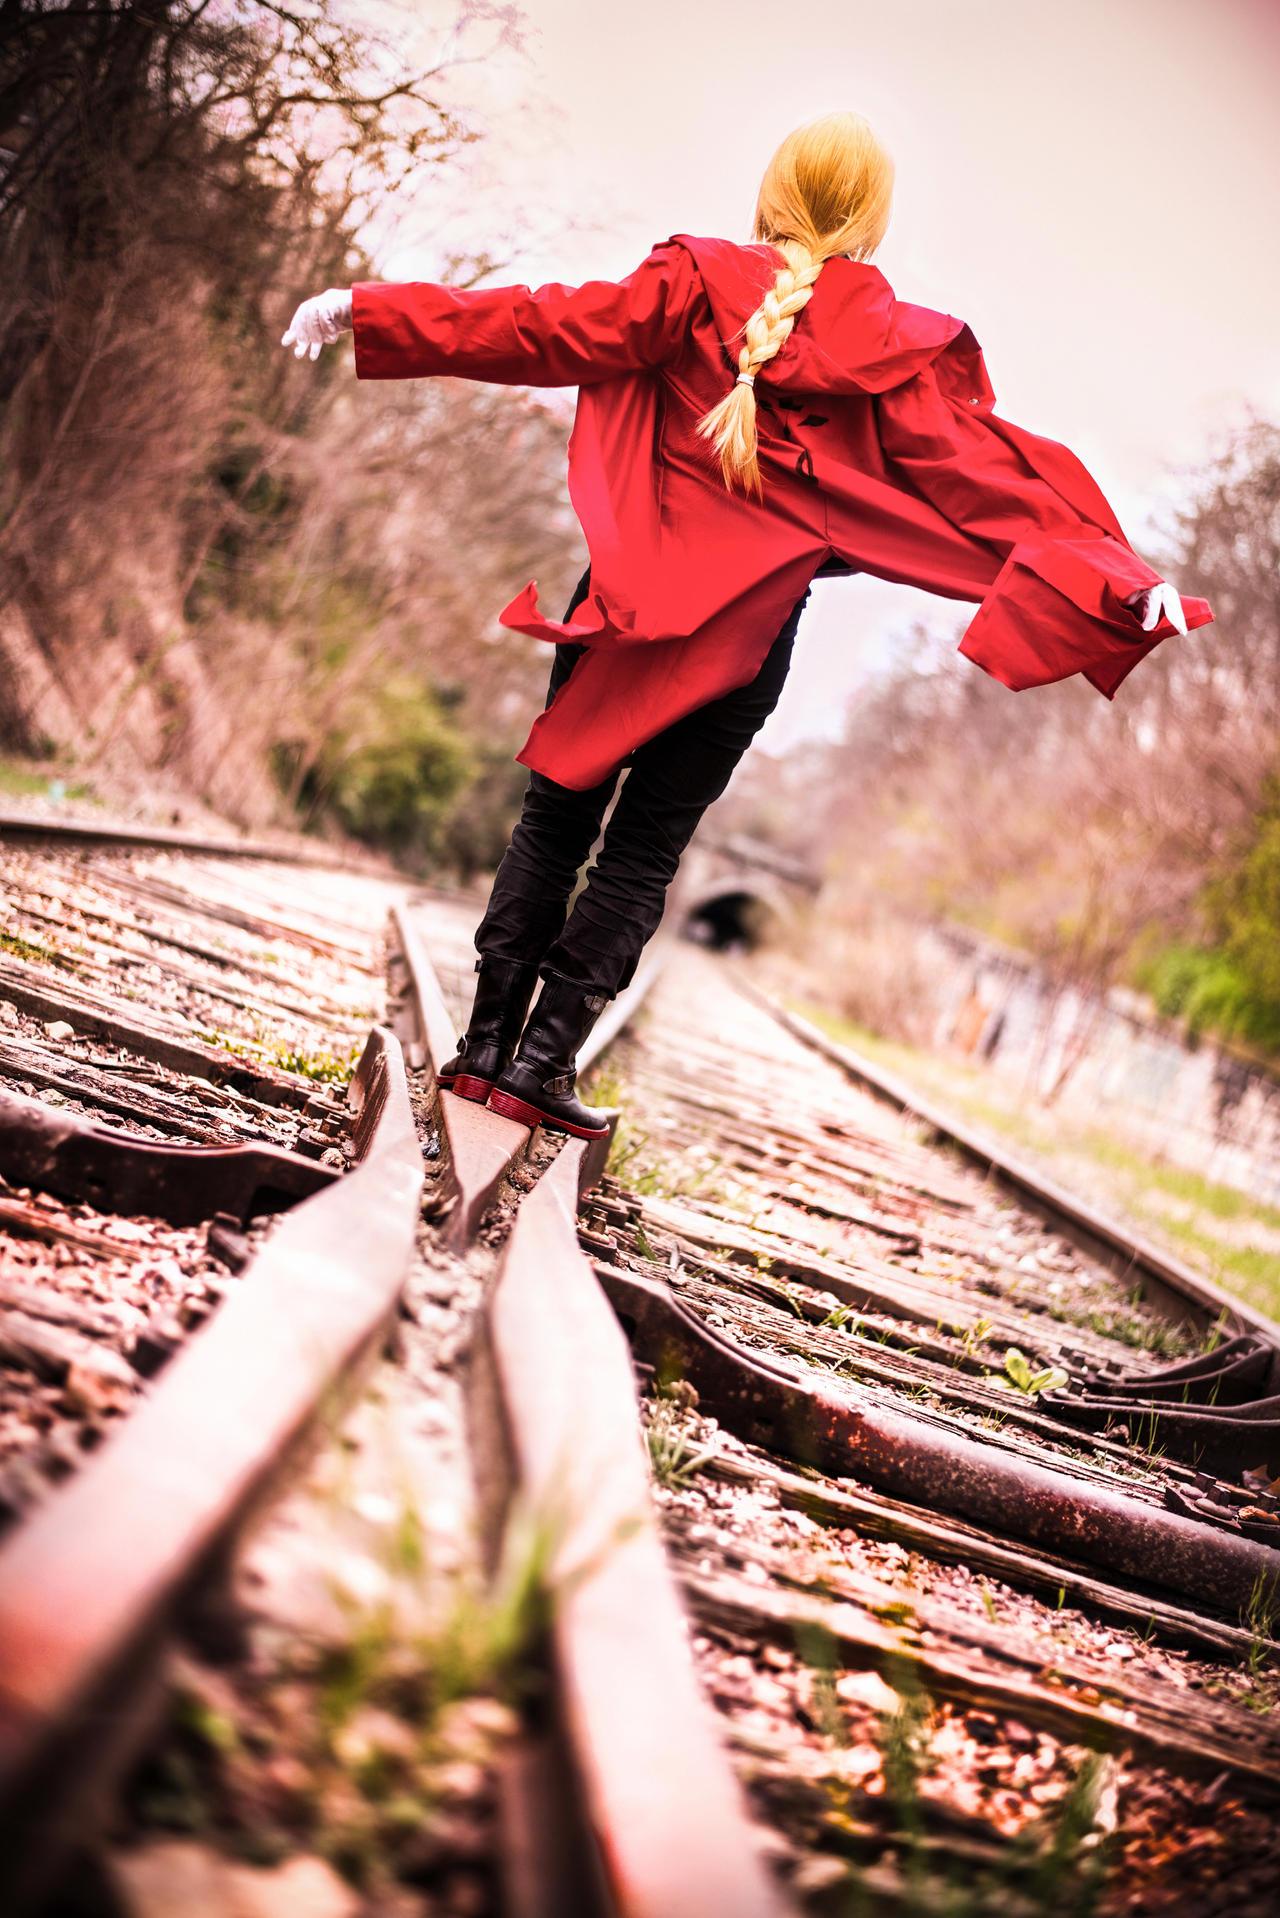 Fullmetal Alchemist - Icarus by TrustOurWorldNow